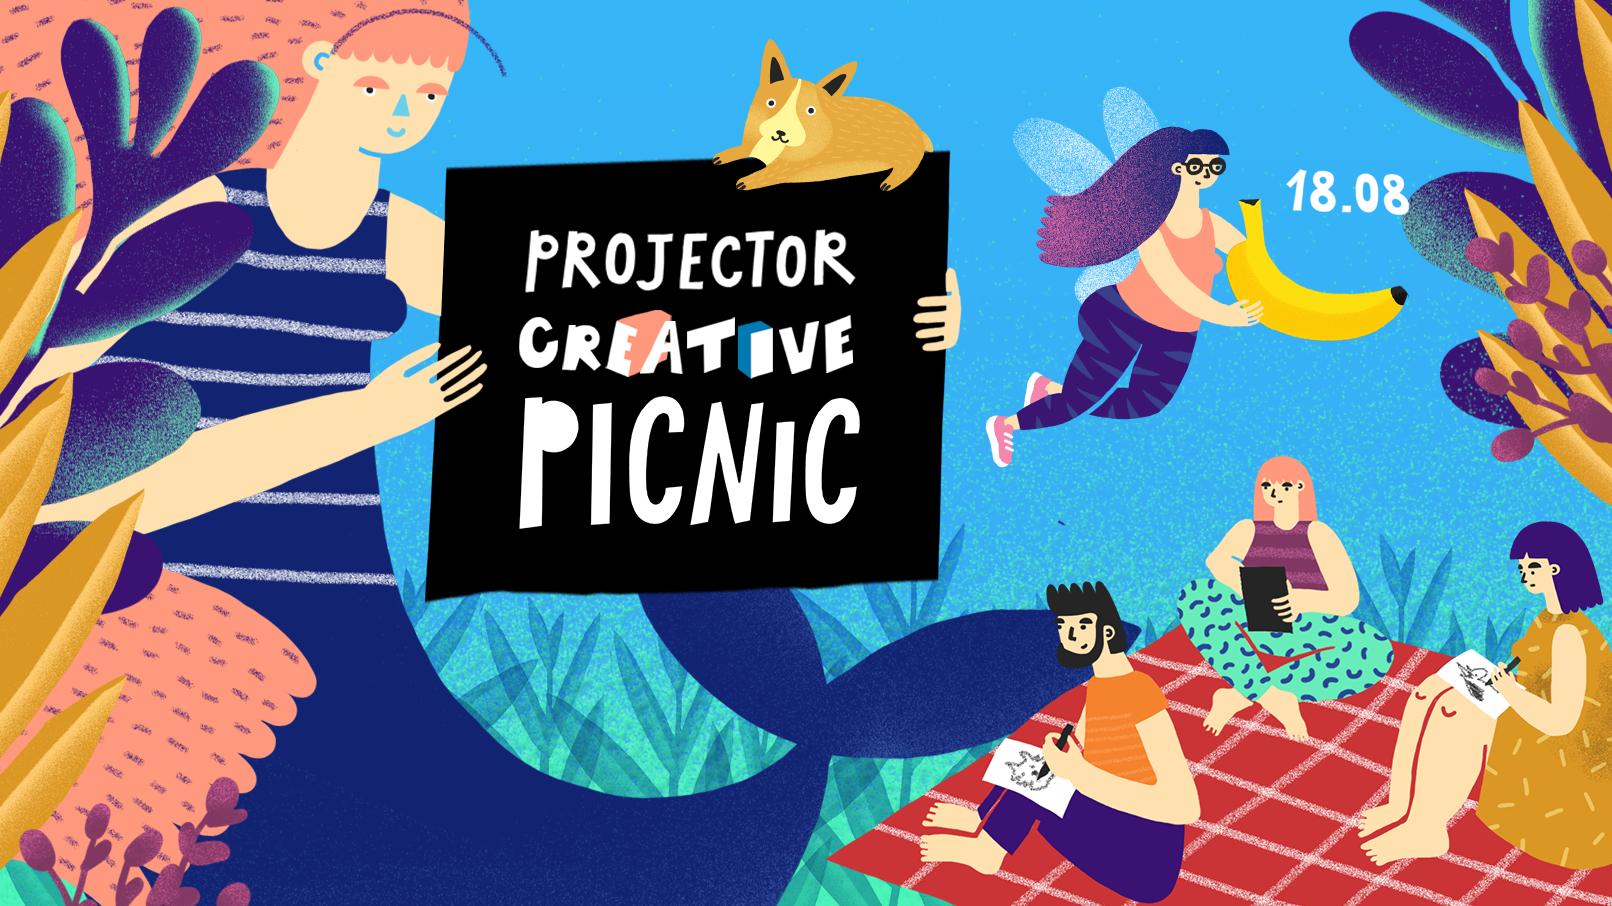 Projector zbyraje na piknik dyzajneriv, iljustratoriv ta mytciv